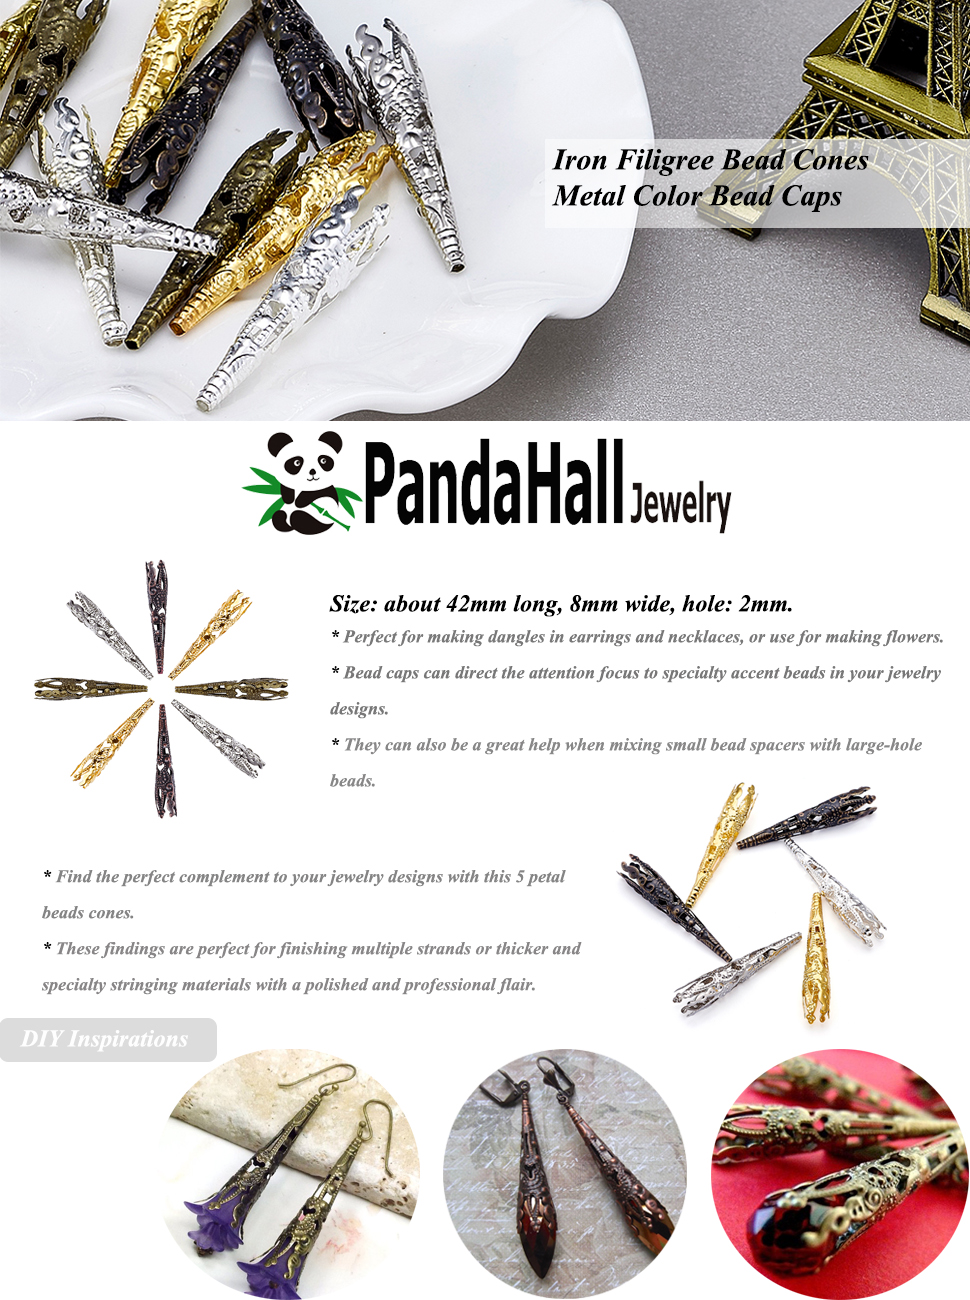 Pandahall 50pcs 5-Petal Iron Mixed Color by Random Bead Cones Filigree Beads Caps 41x8mm DIY Crafting Earring Jewelry Makings